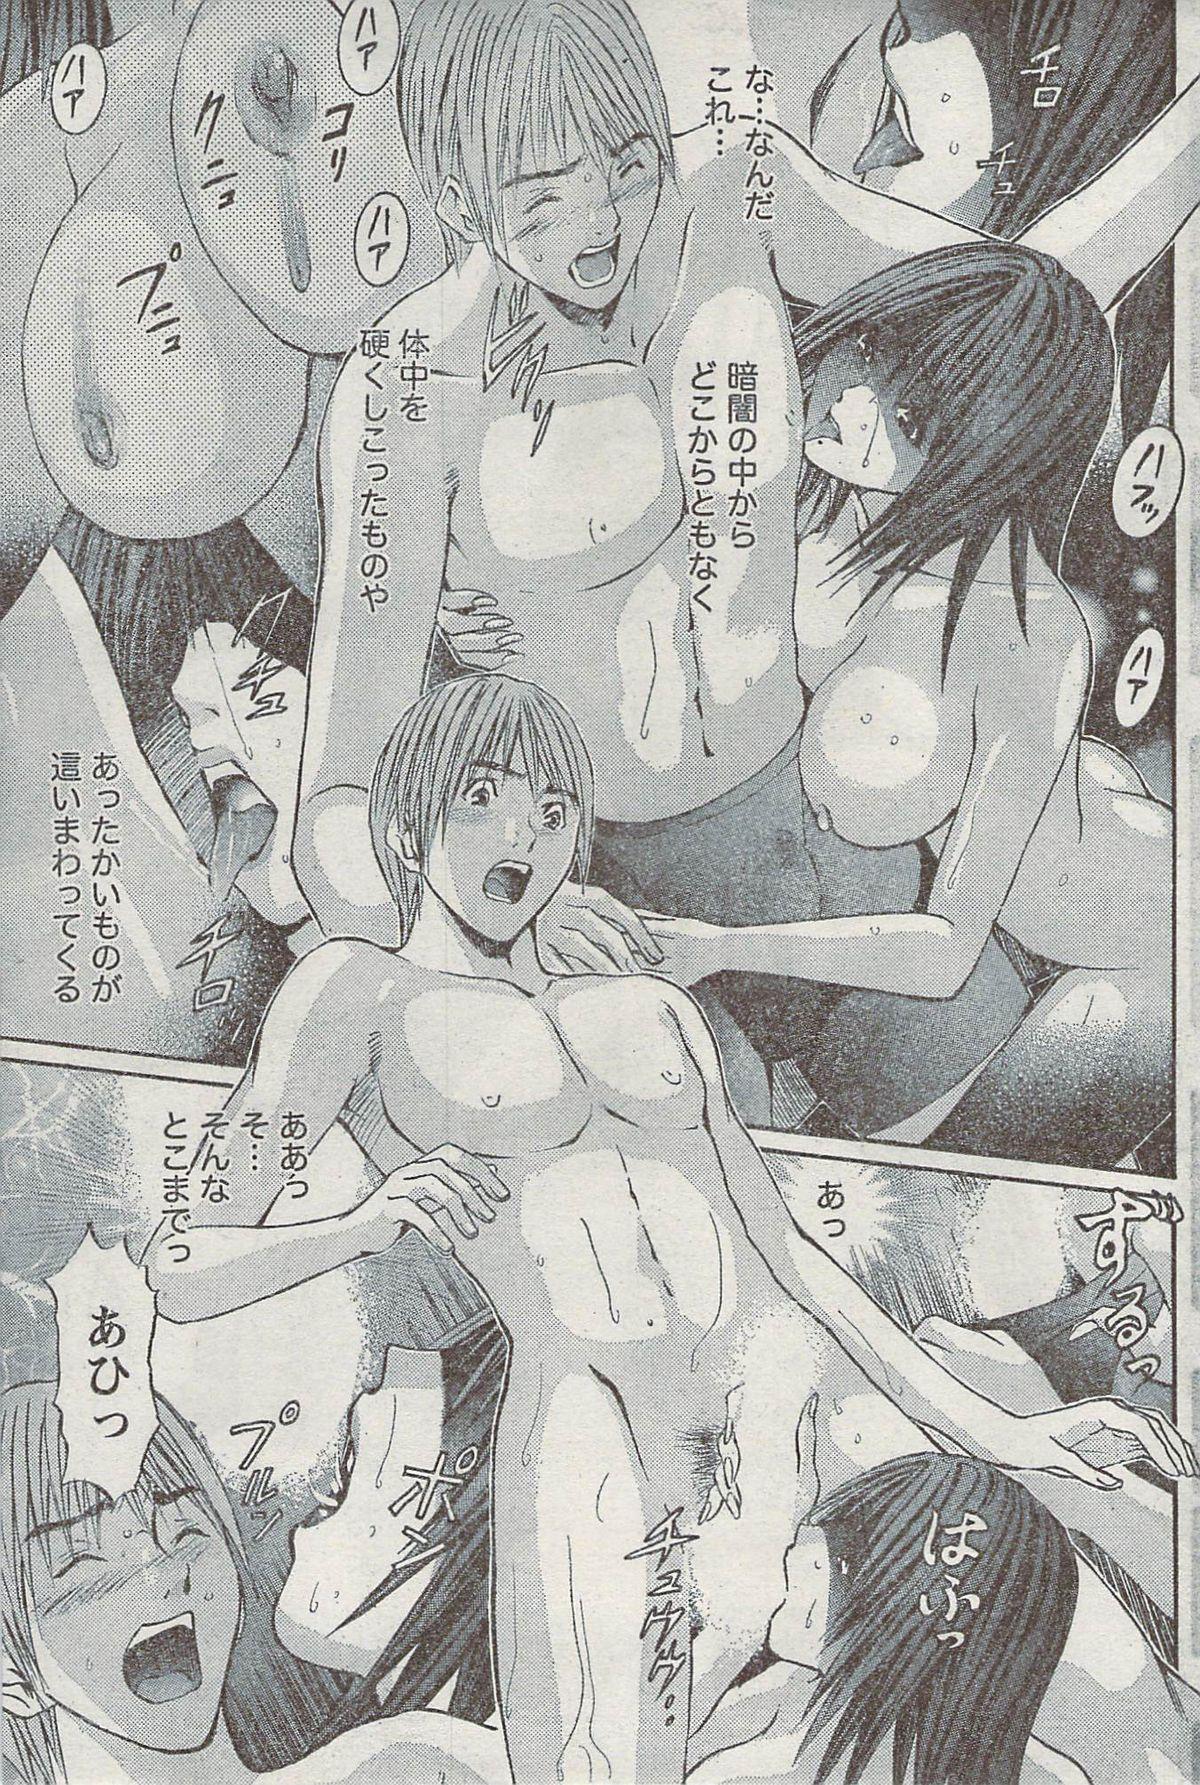 Monthly Vitaman 2007-08 72